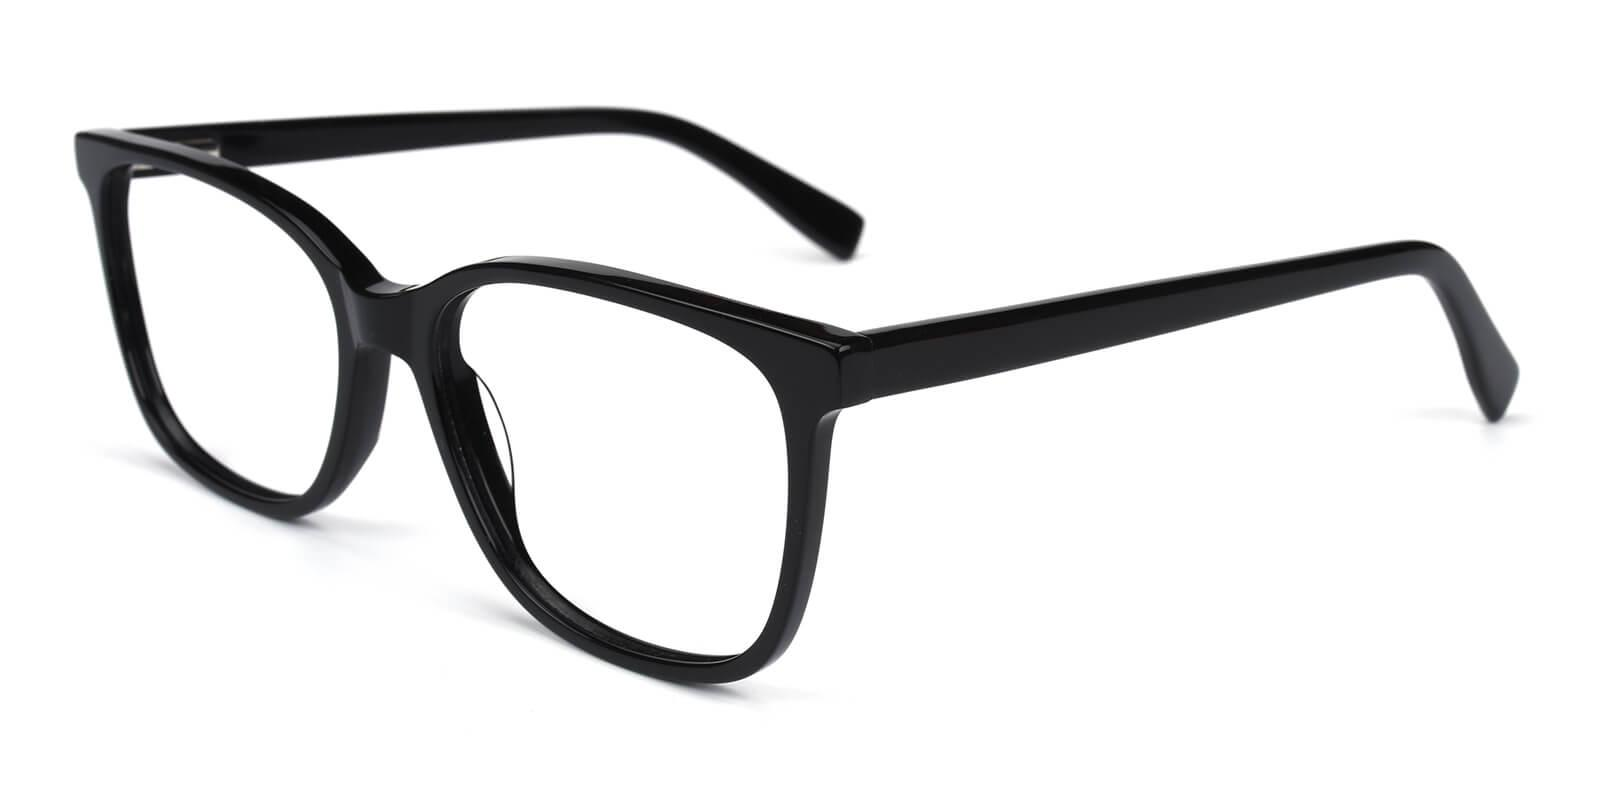 Defeny-Black-Square-Acetate-Eyeglasses-detail